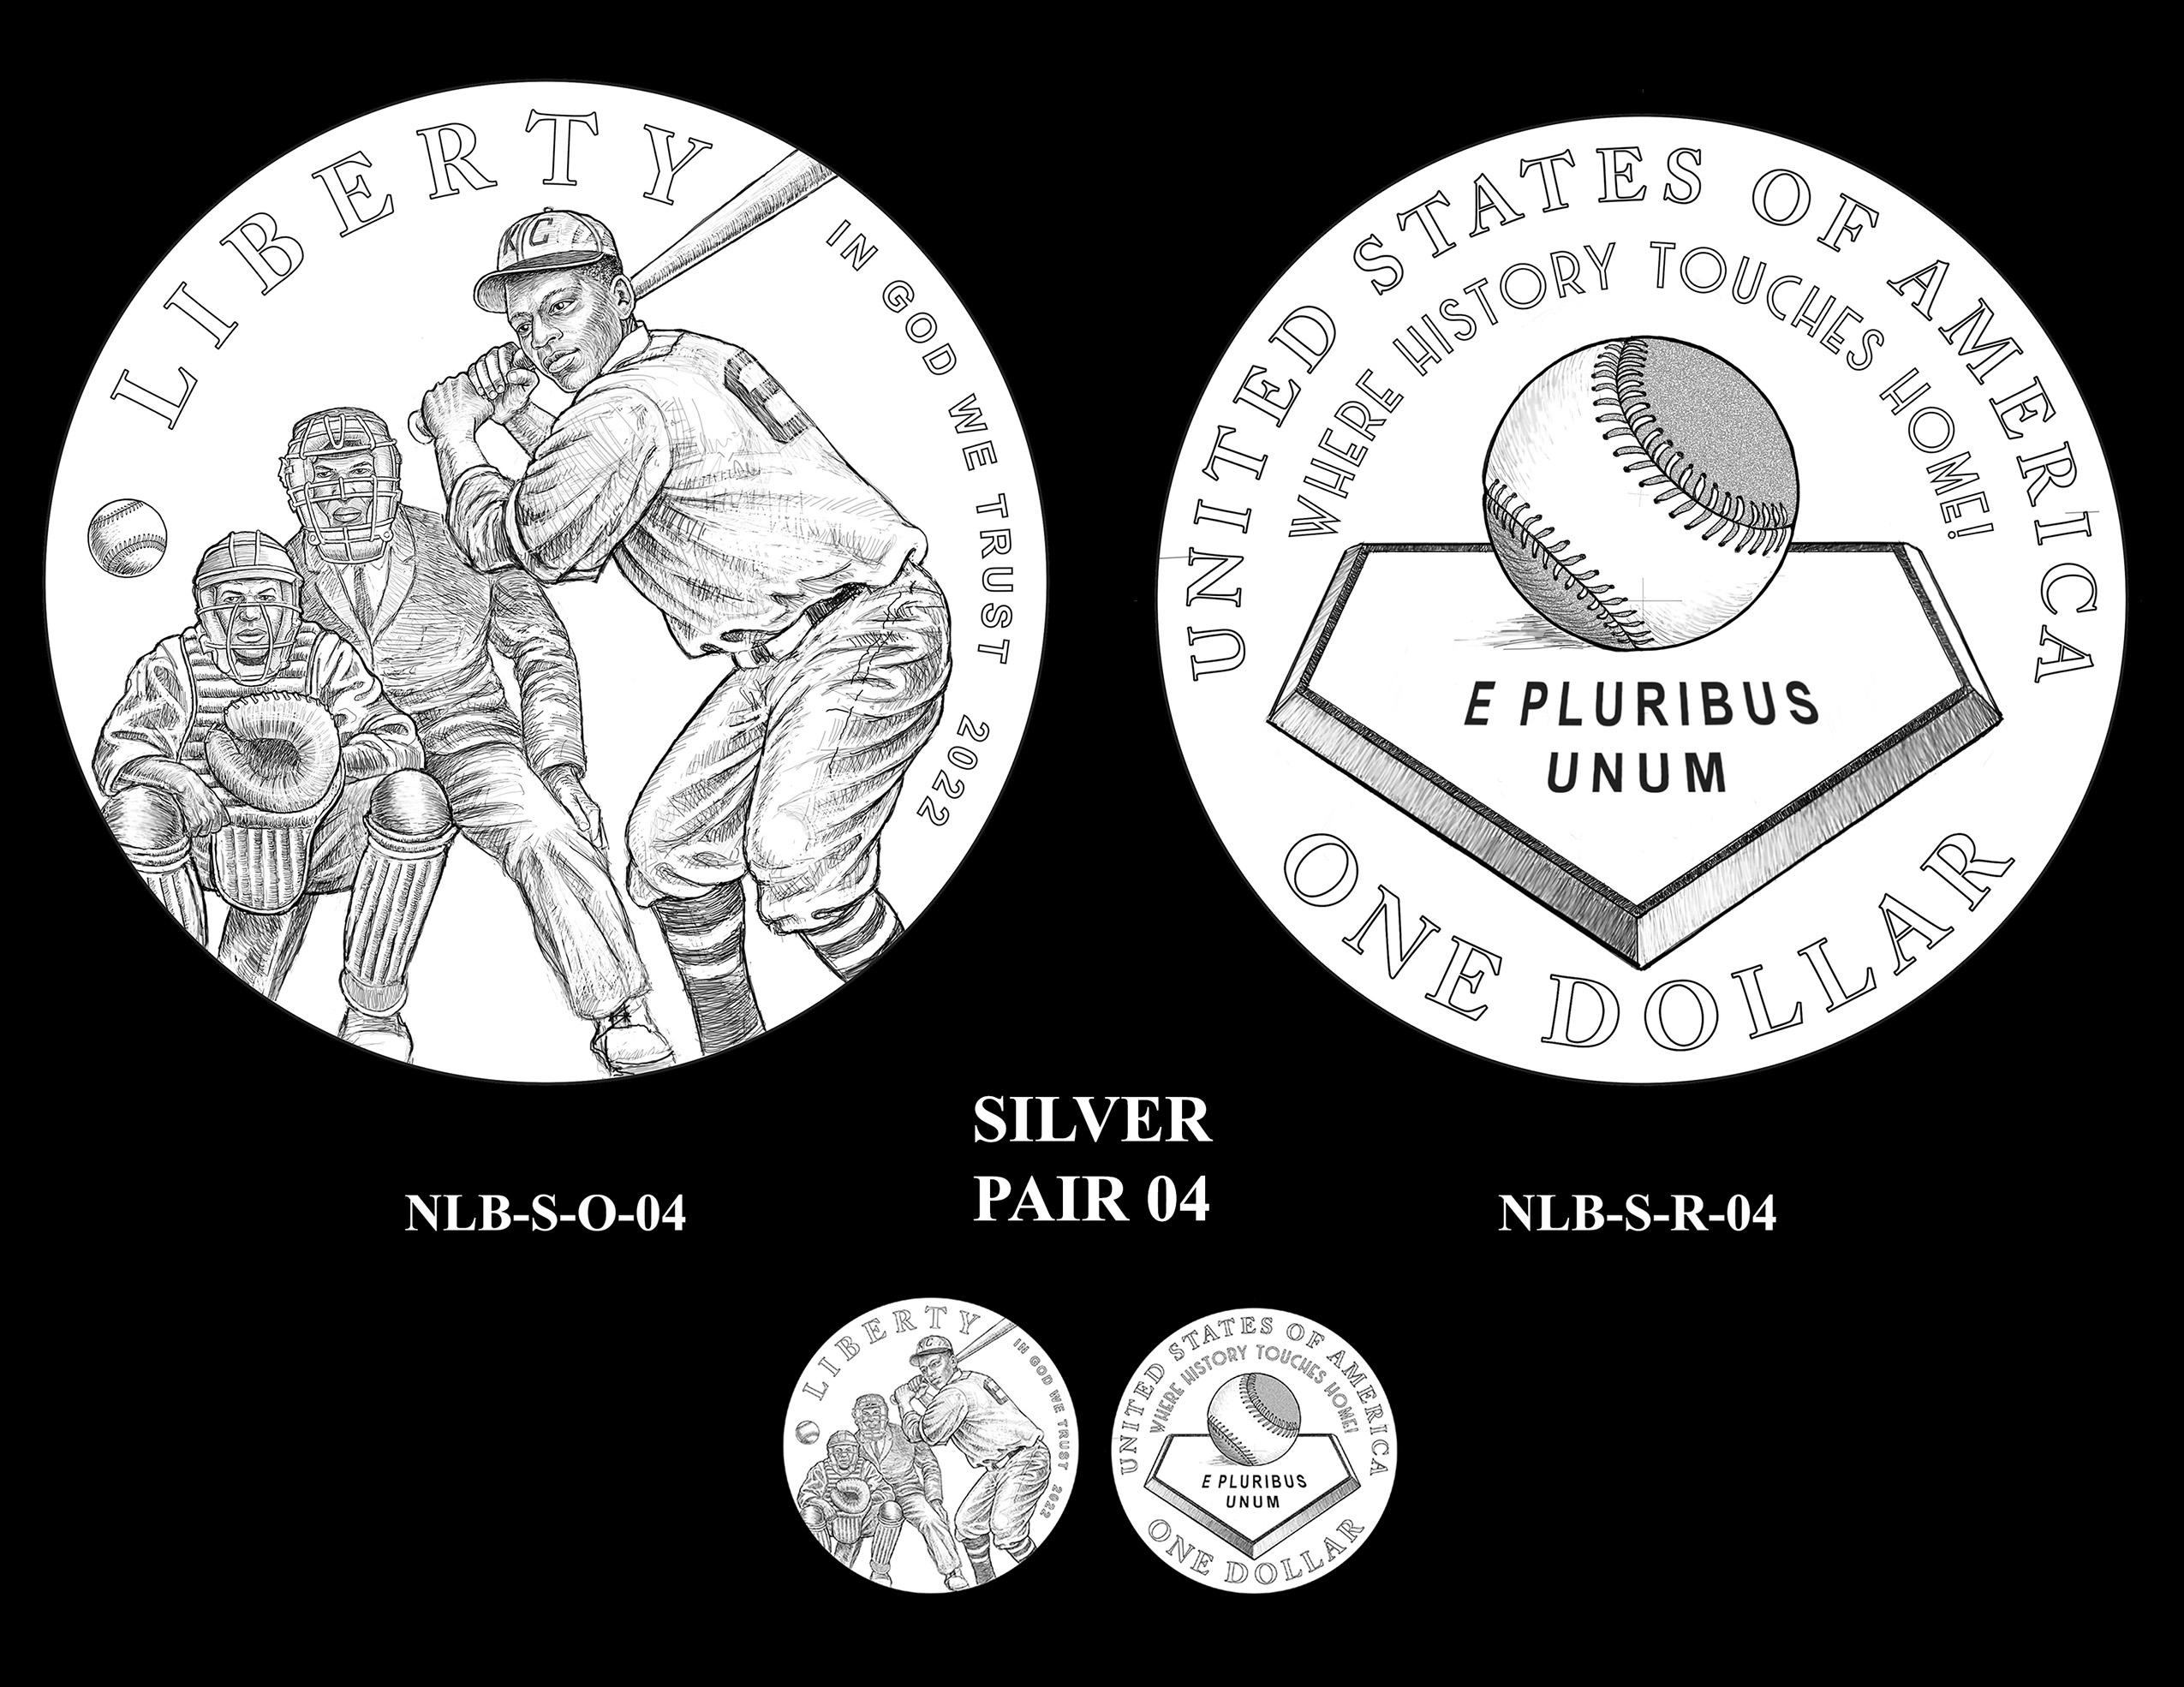 Silver Pair 04 -- Negro Leagues Baseball Commemorative Coin Program